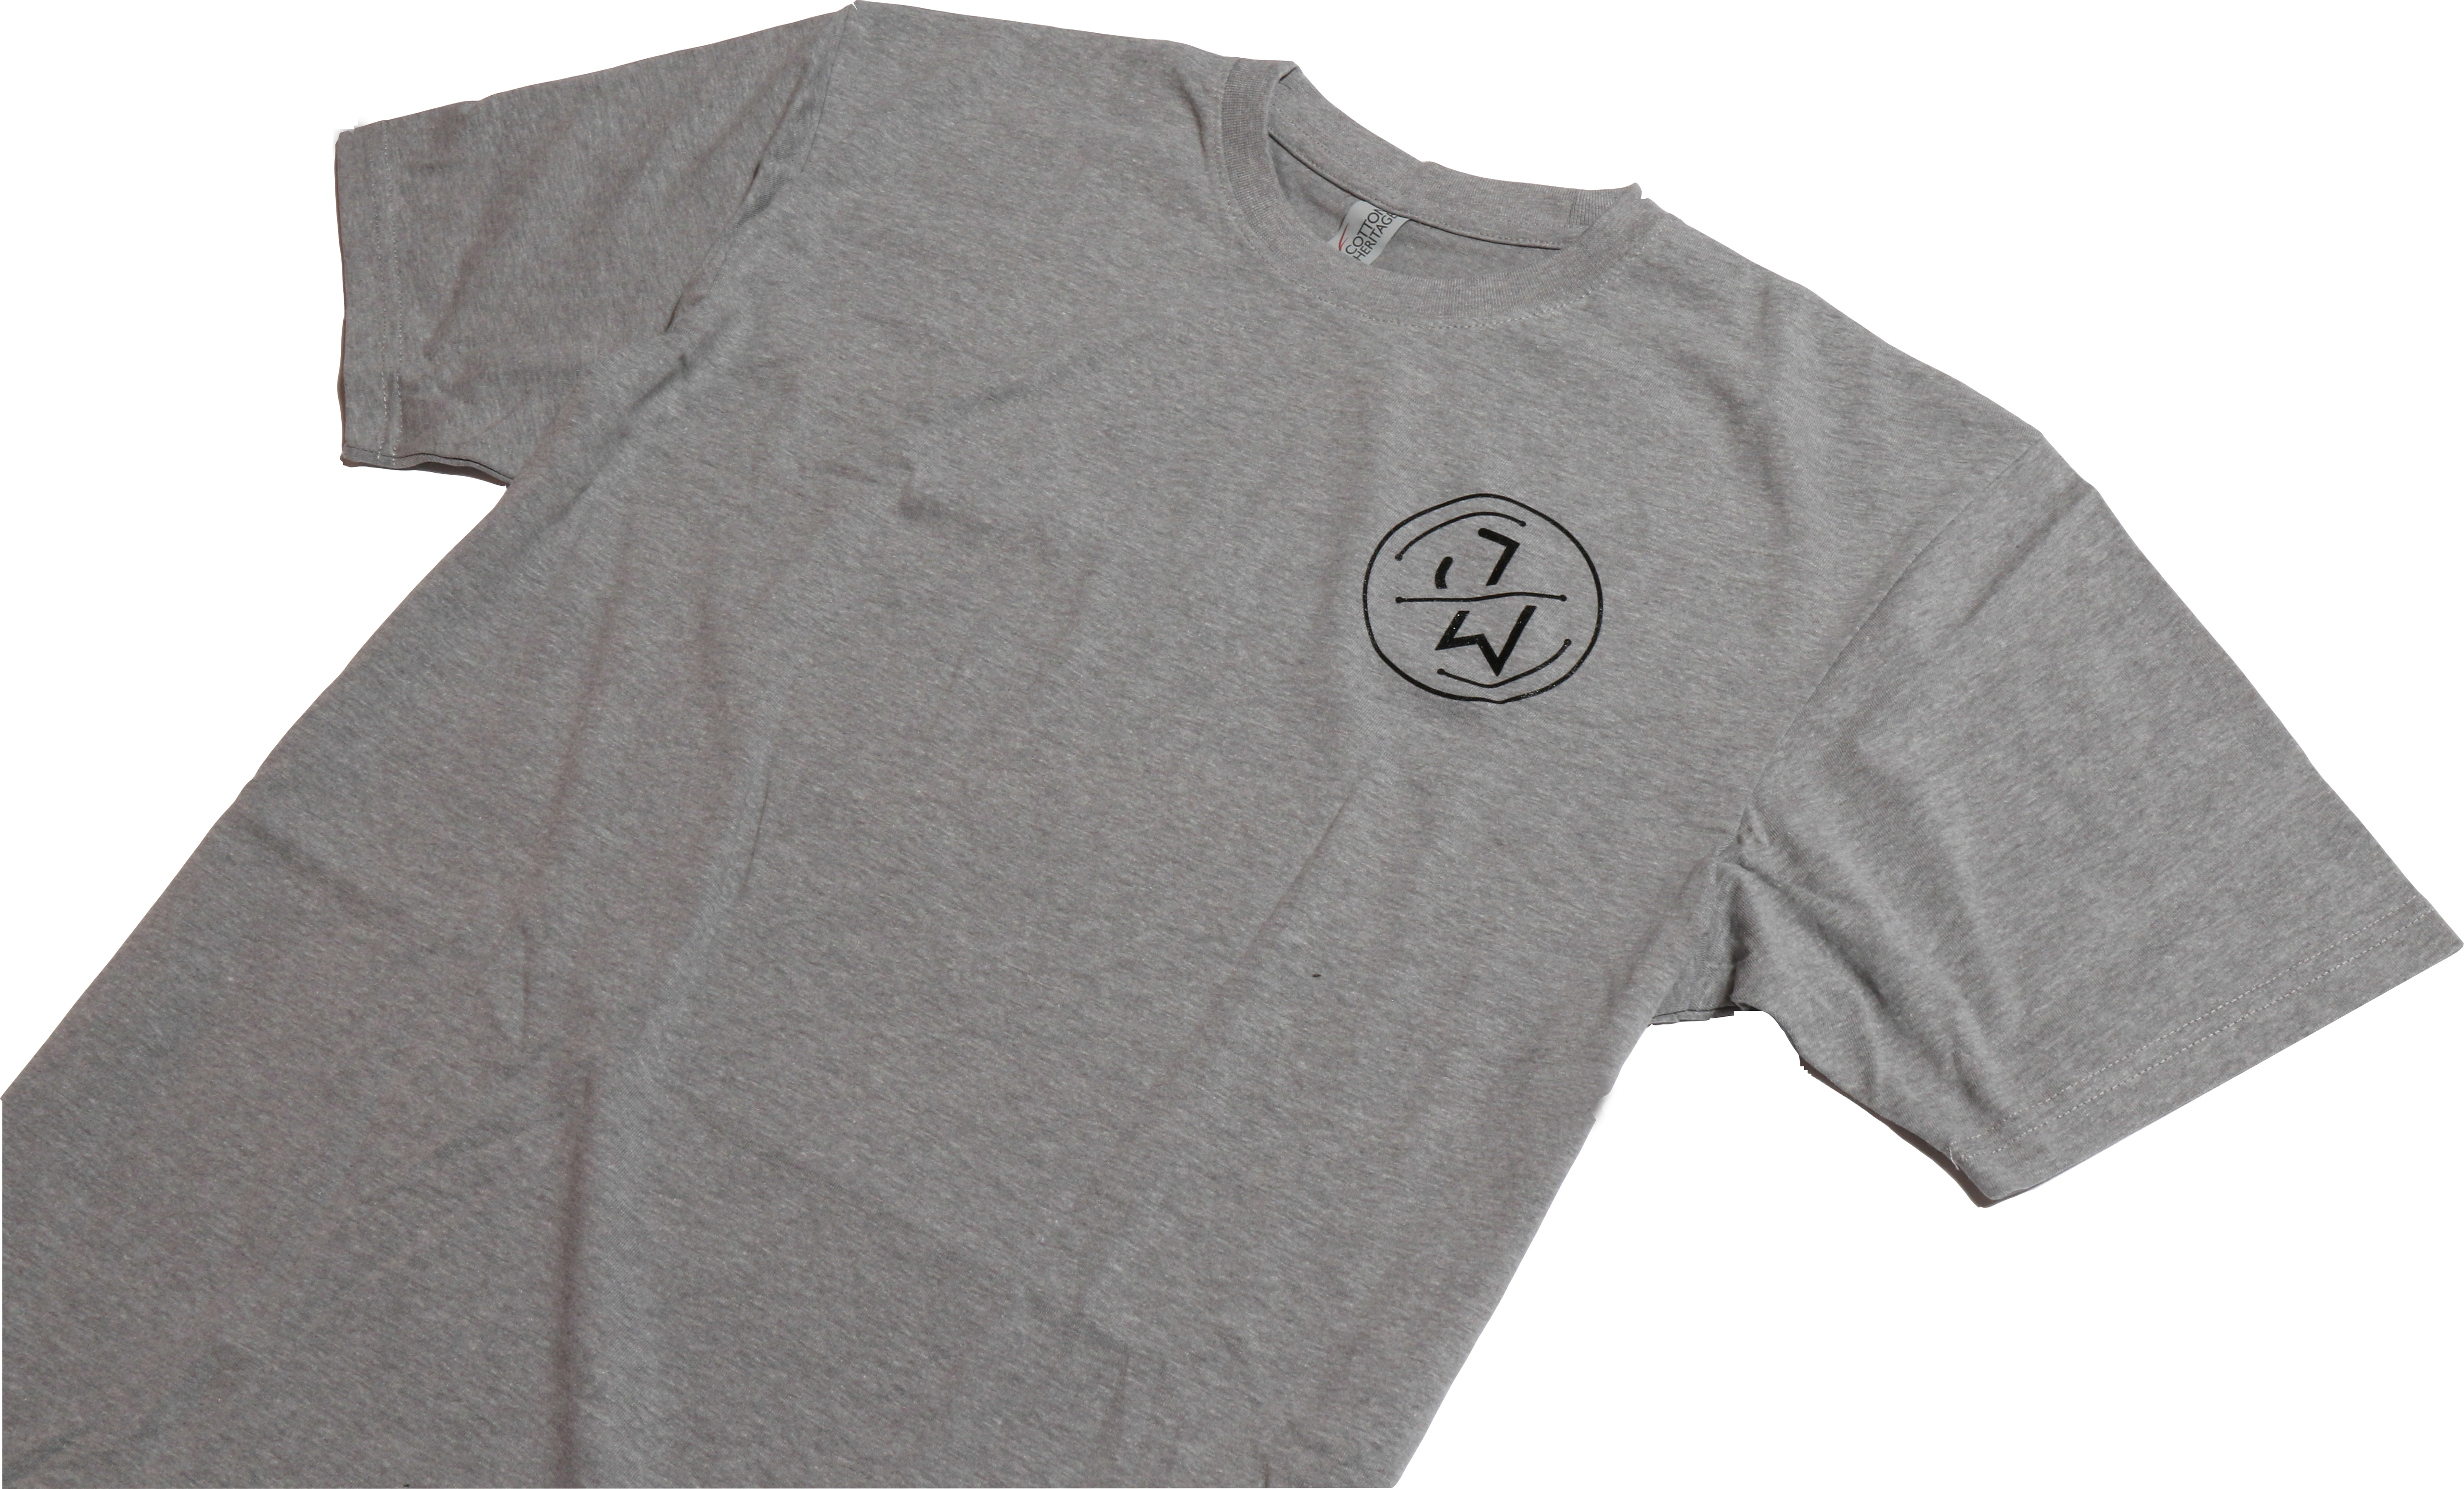 Jake Wyatt Cigar Co. T-Shirt - Grey